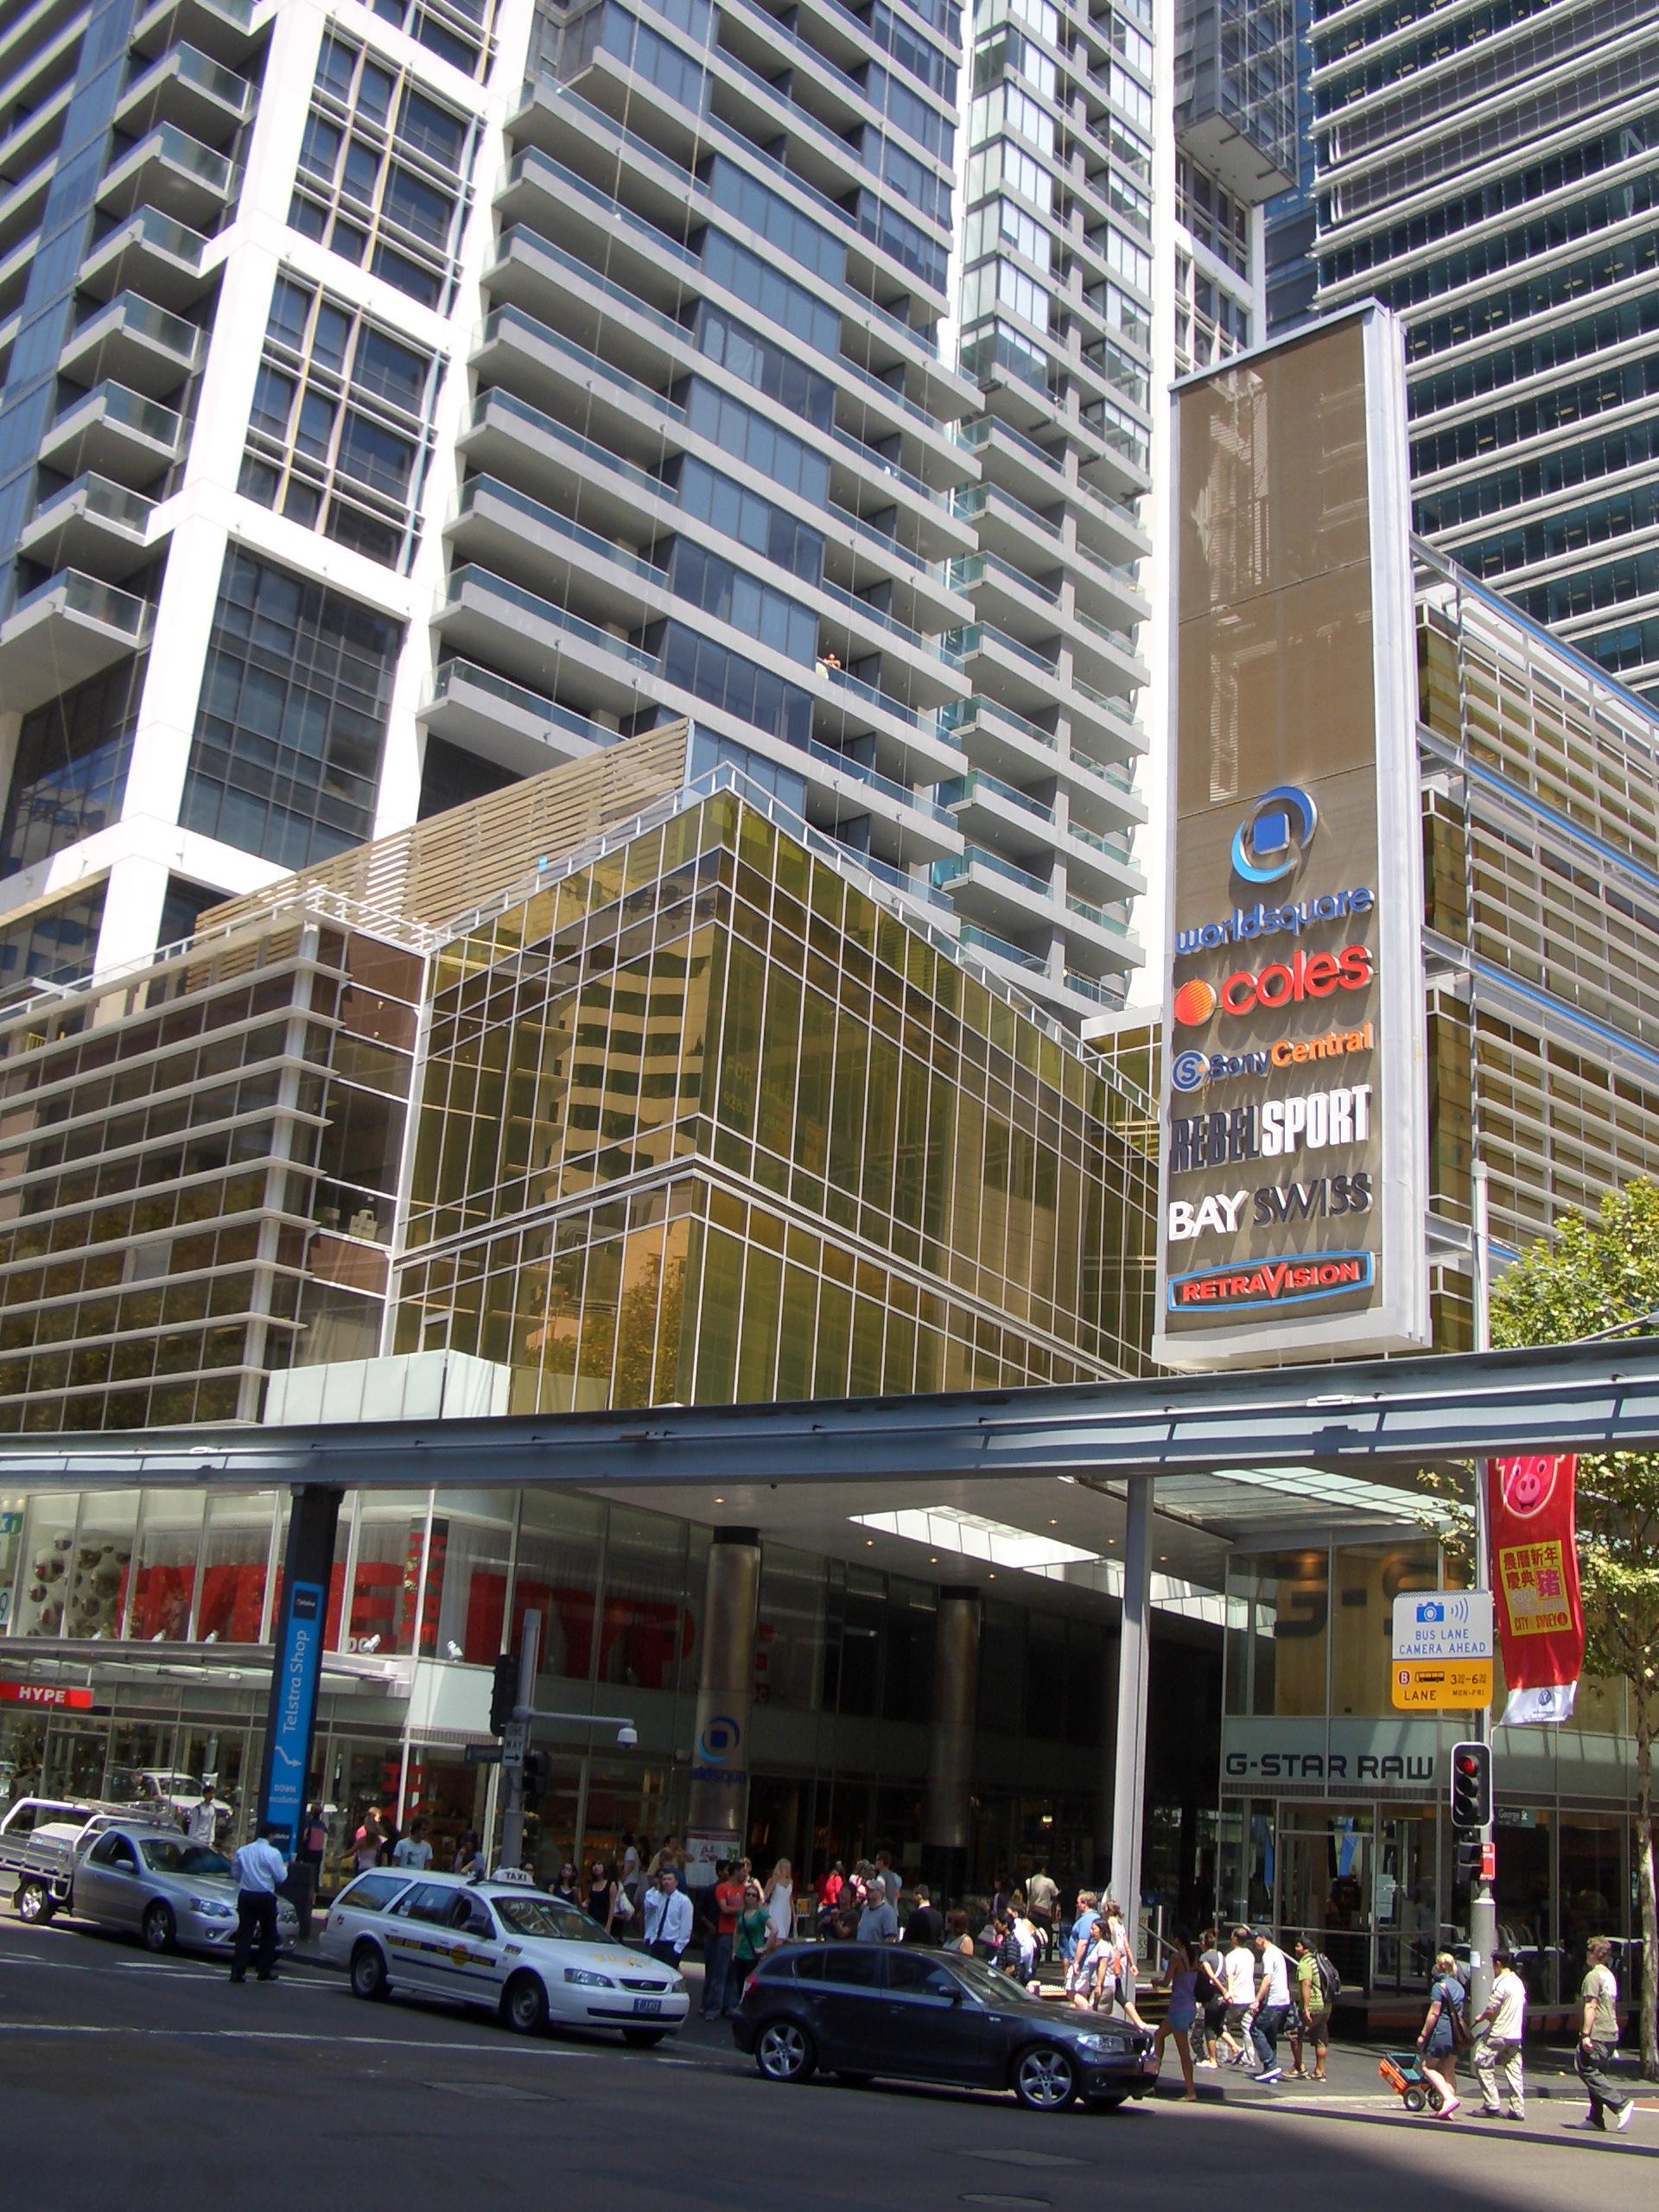 Dates in spanish in Sydney